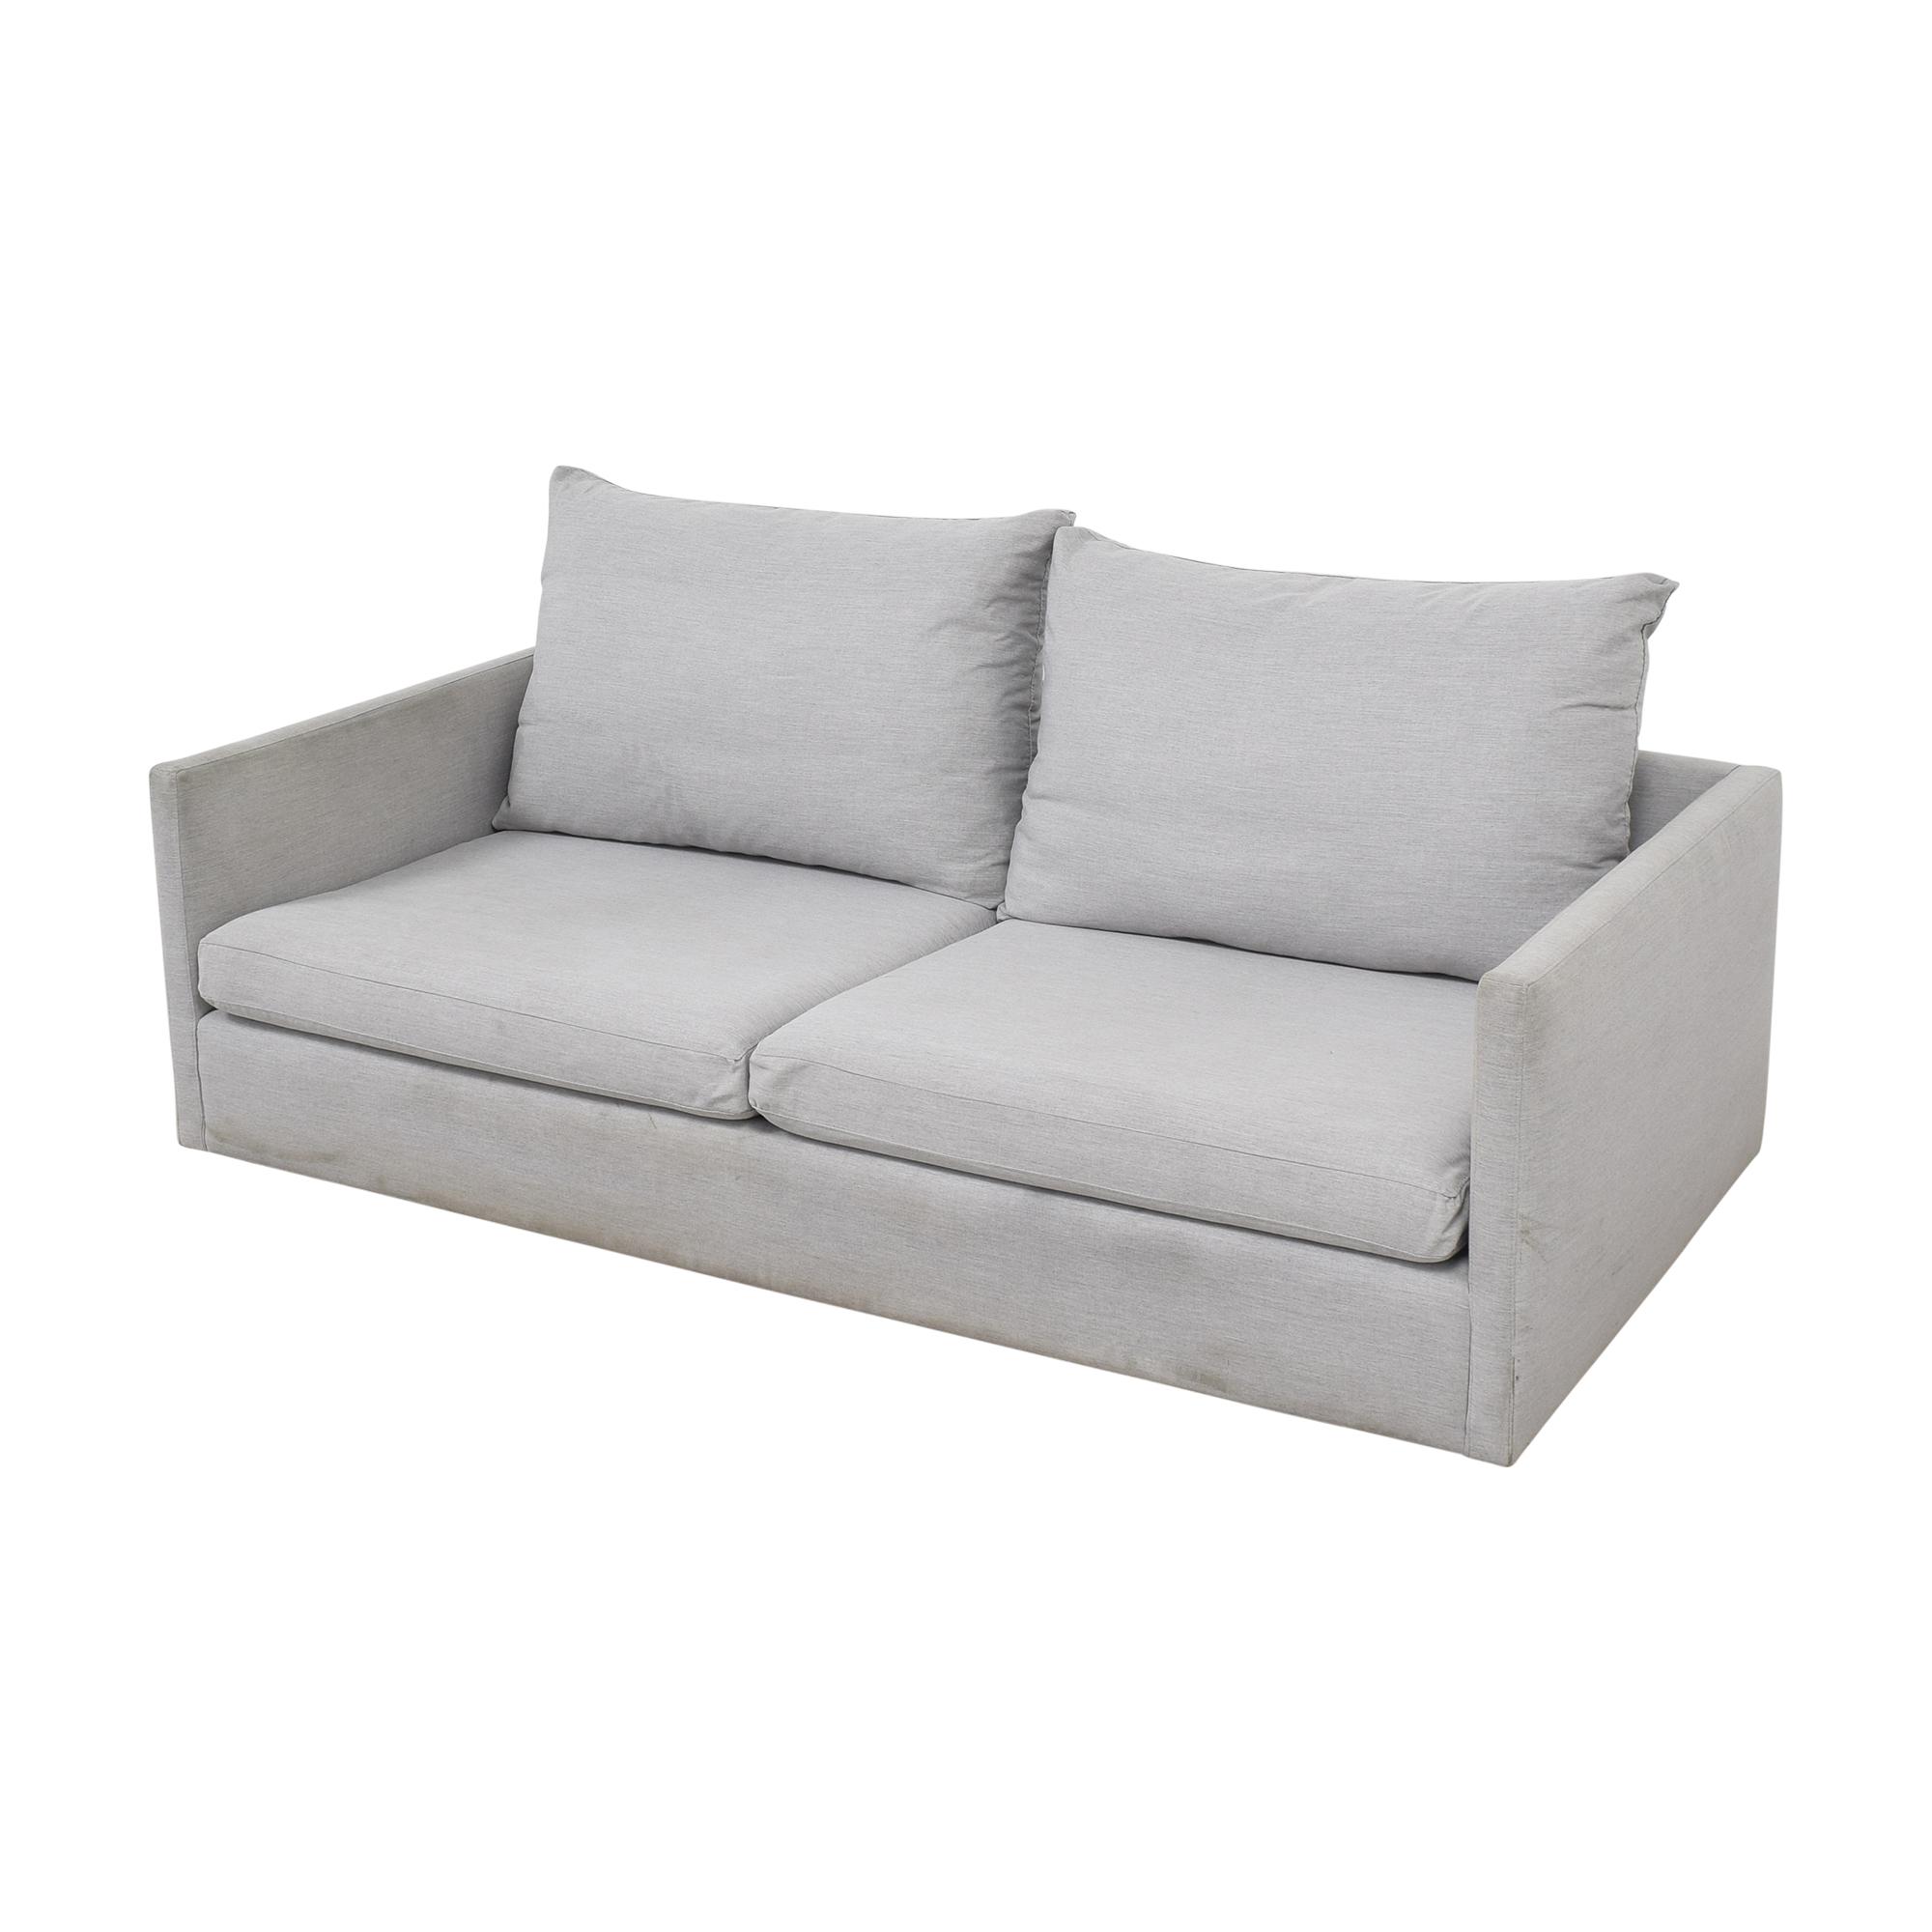 buy ABC Carpet & Home Two Cushion Sofa ABC Carpet & Home Sofas